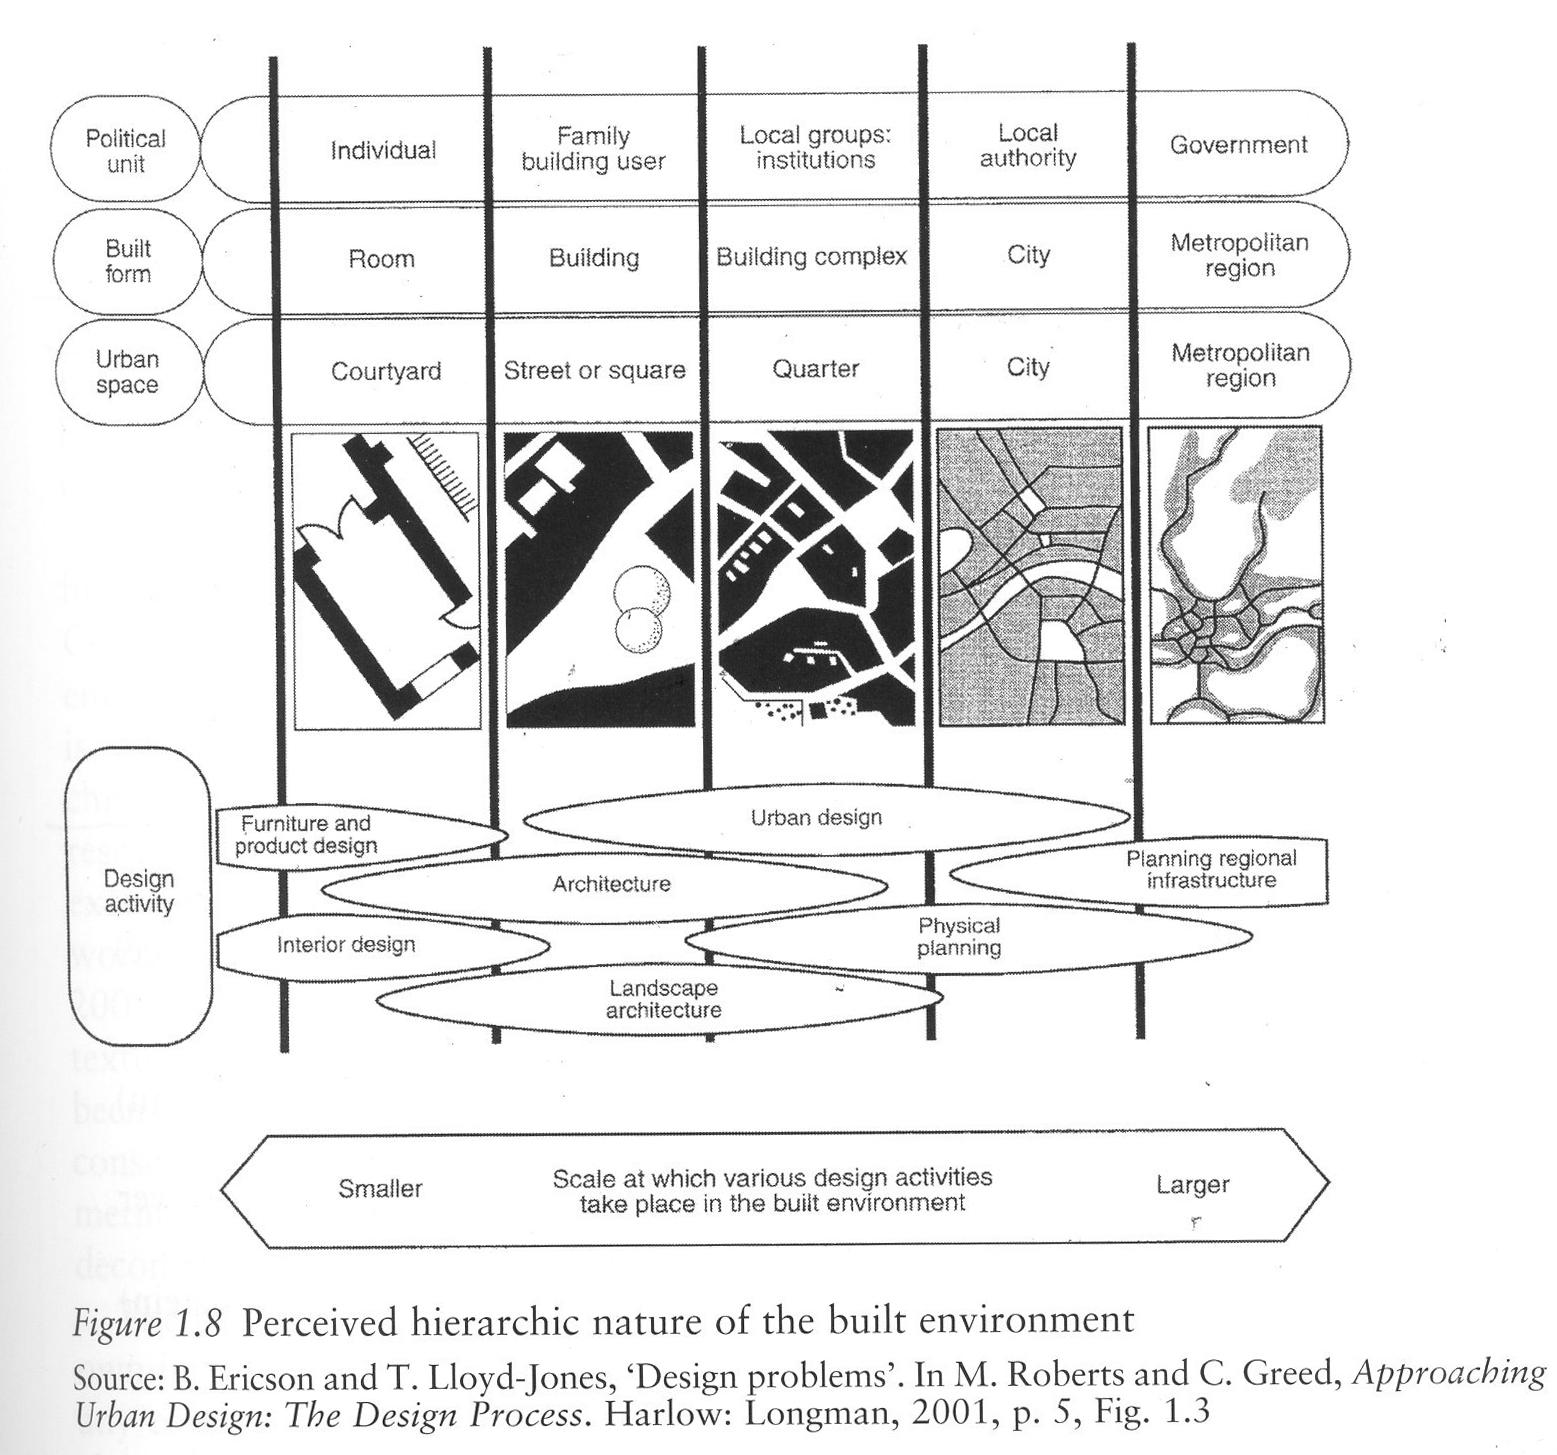 alexander cuthbert on urban design methodology urban choreography